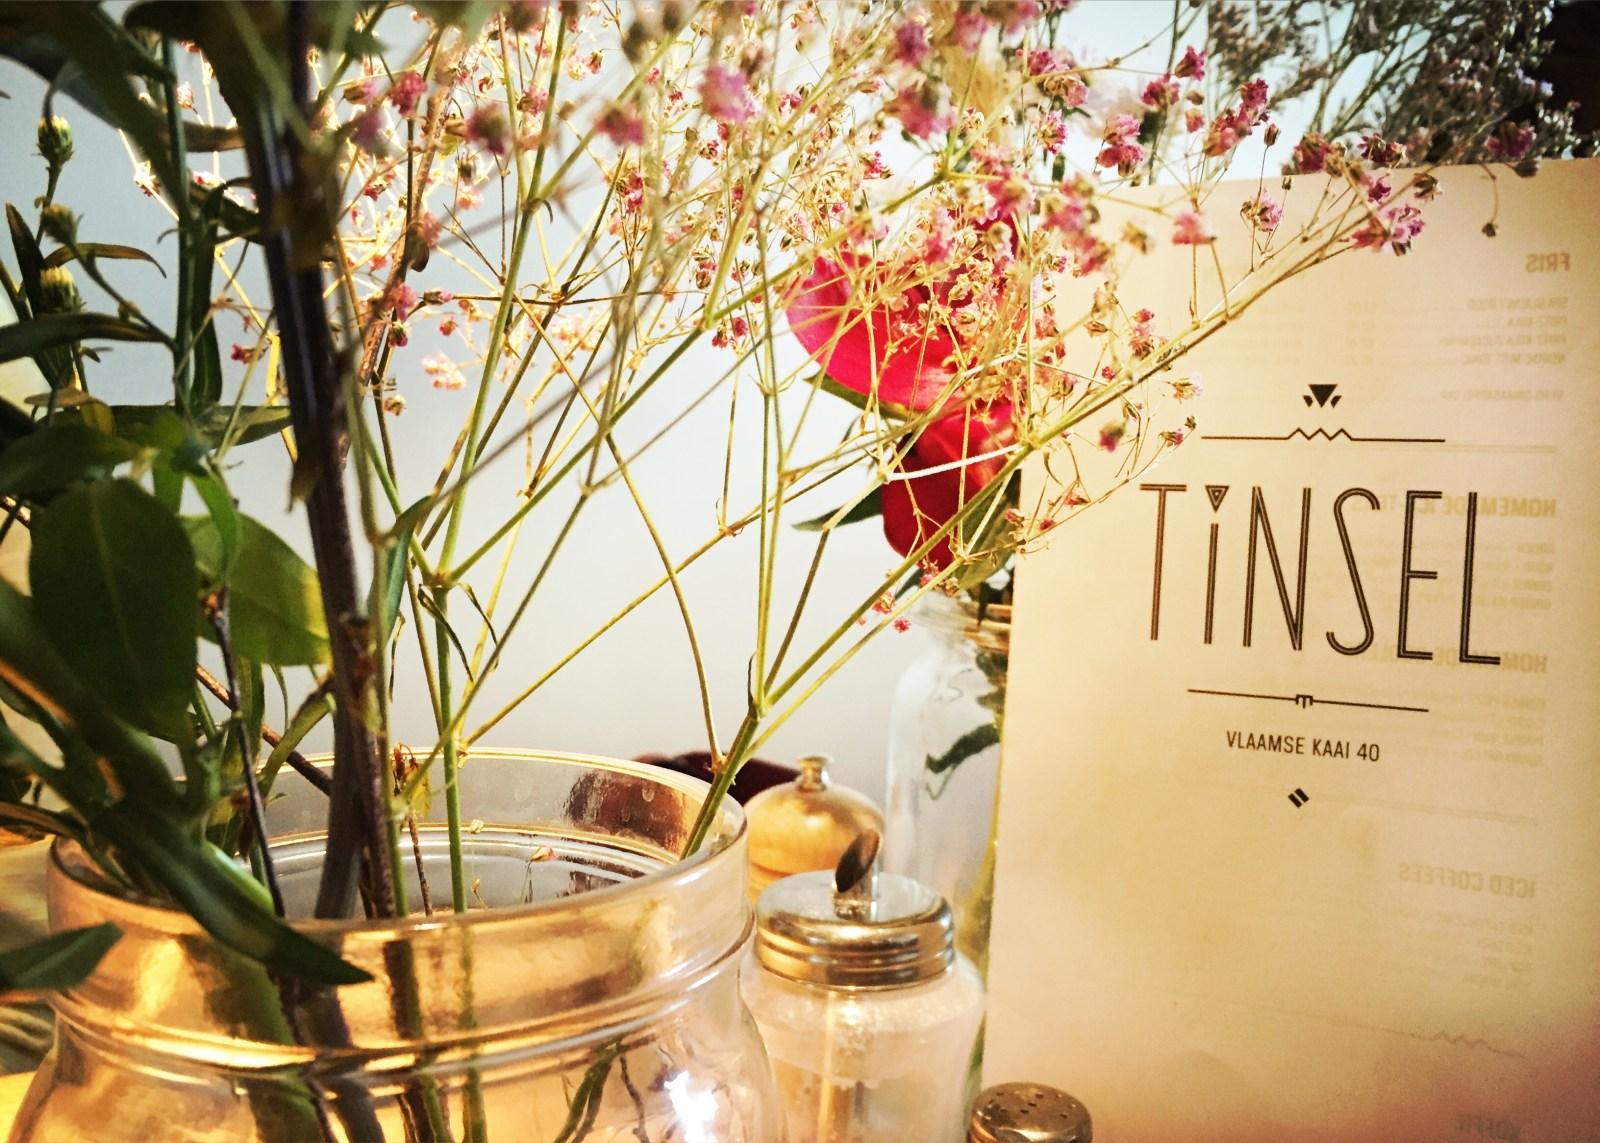 Tinsel